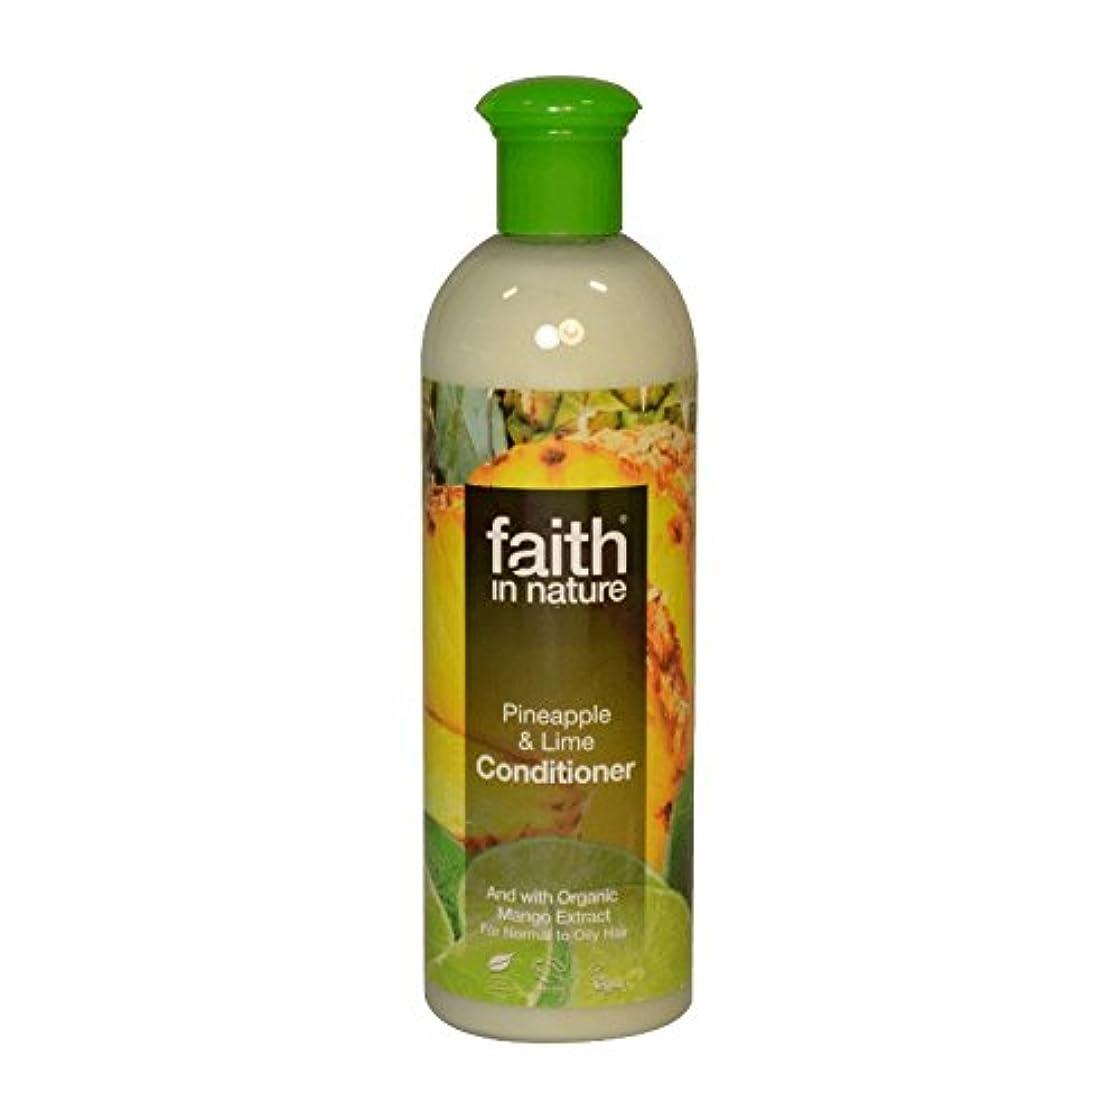 Faith in Nature Pineapple & Lime Conditioner 400ml (Pack of 2) - 自然パイナップル&ライムコンディショナー400ミリリットルの信仰 (x2) [並行輸入品]